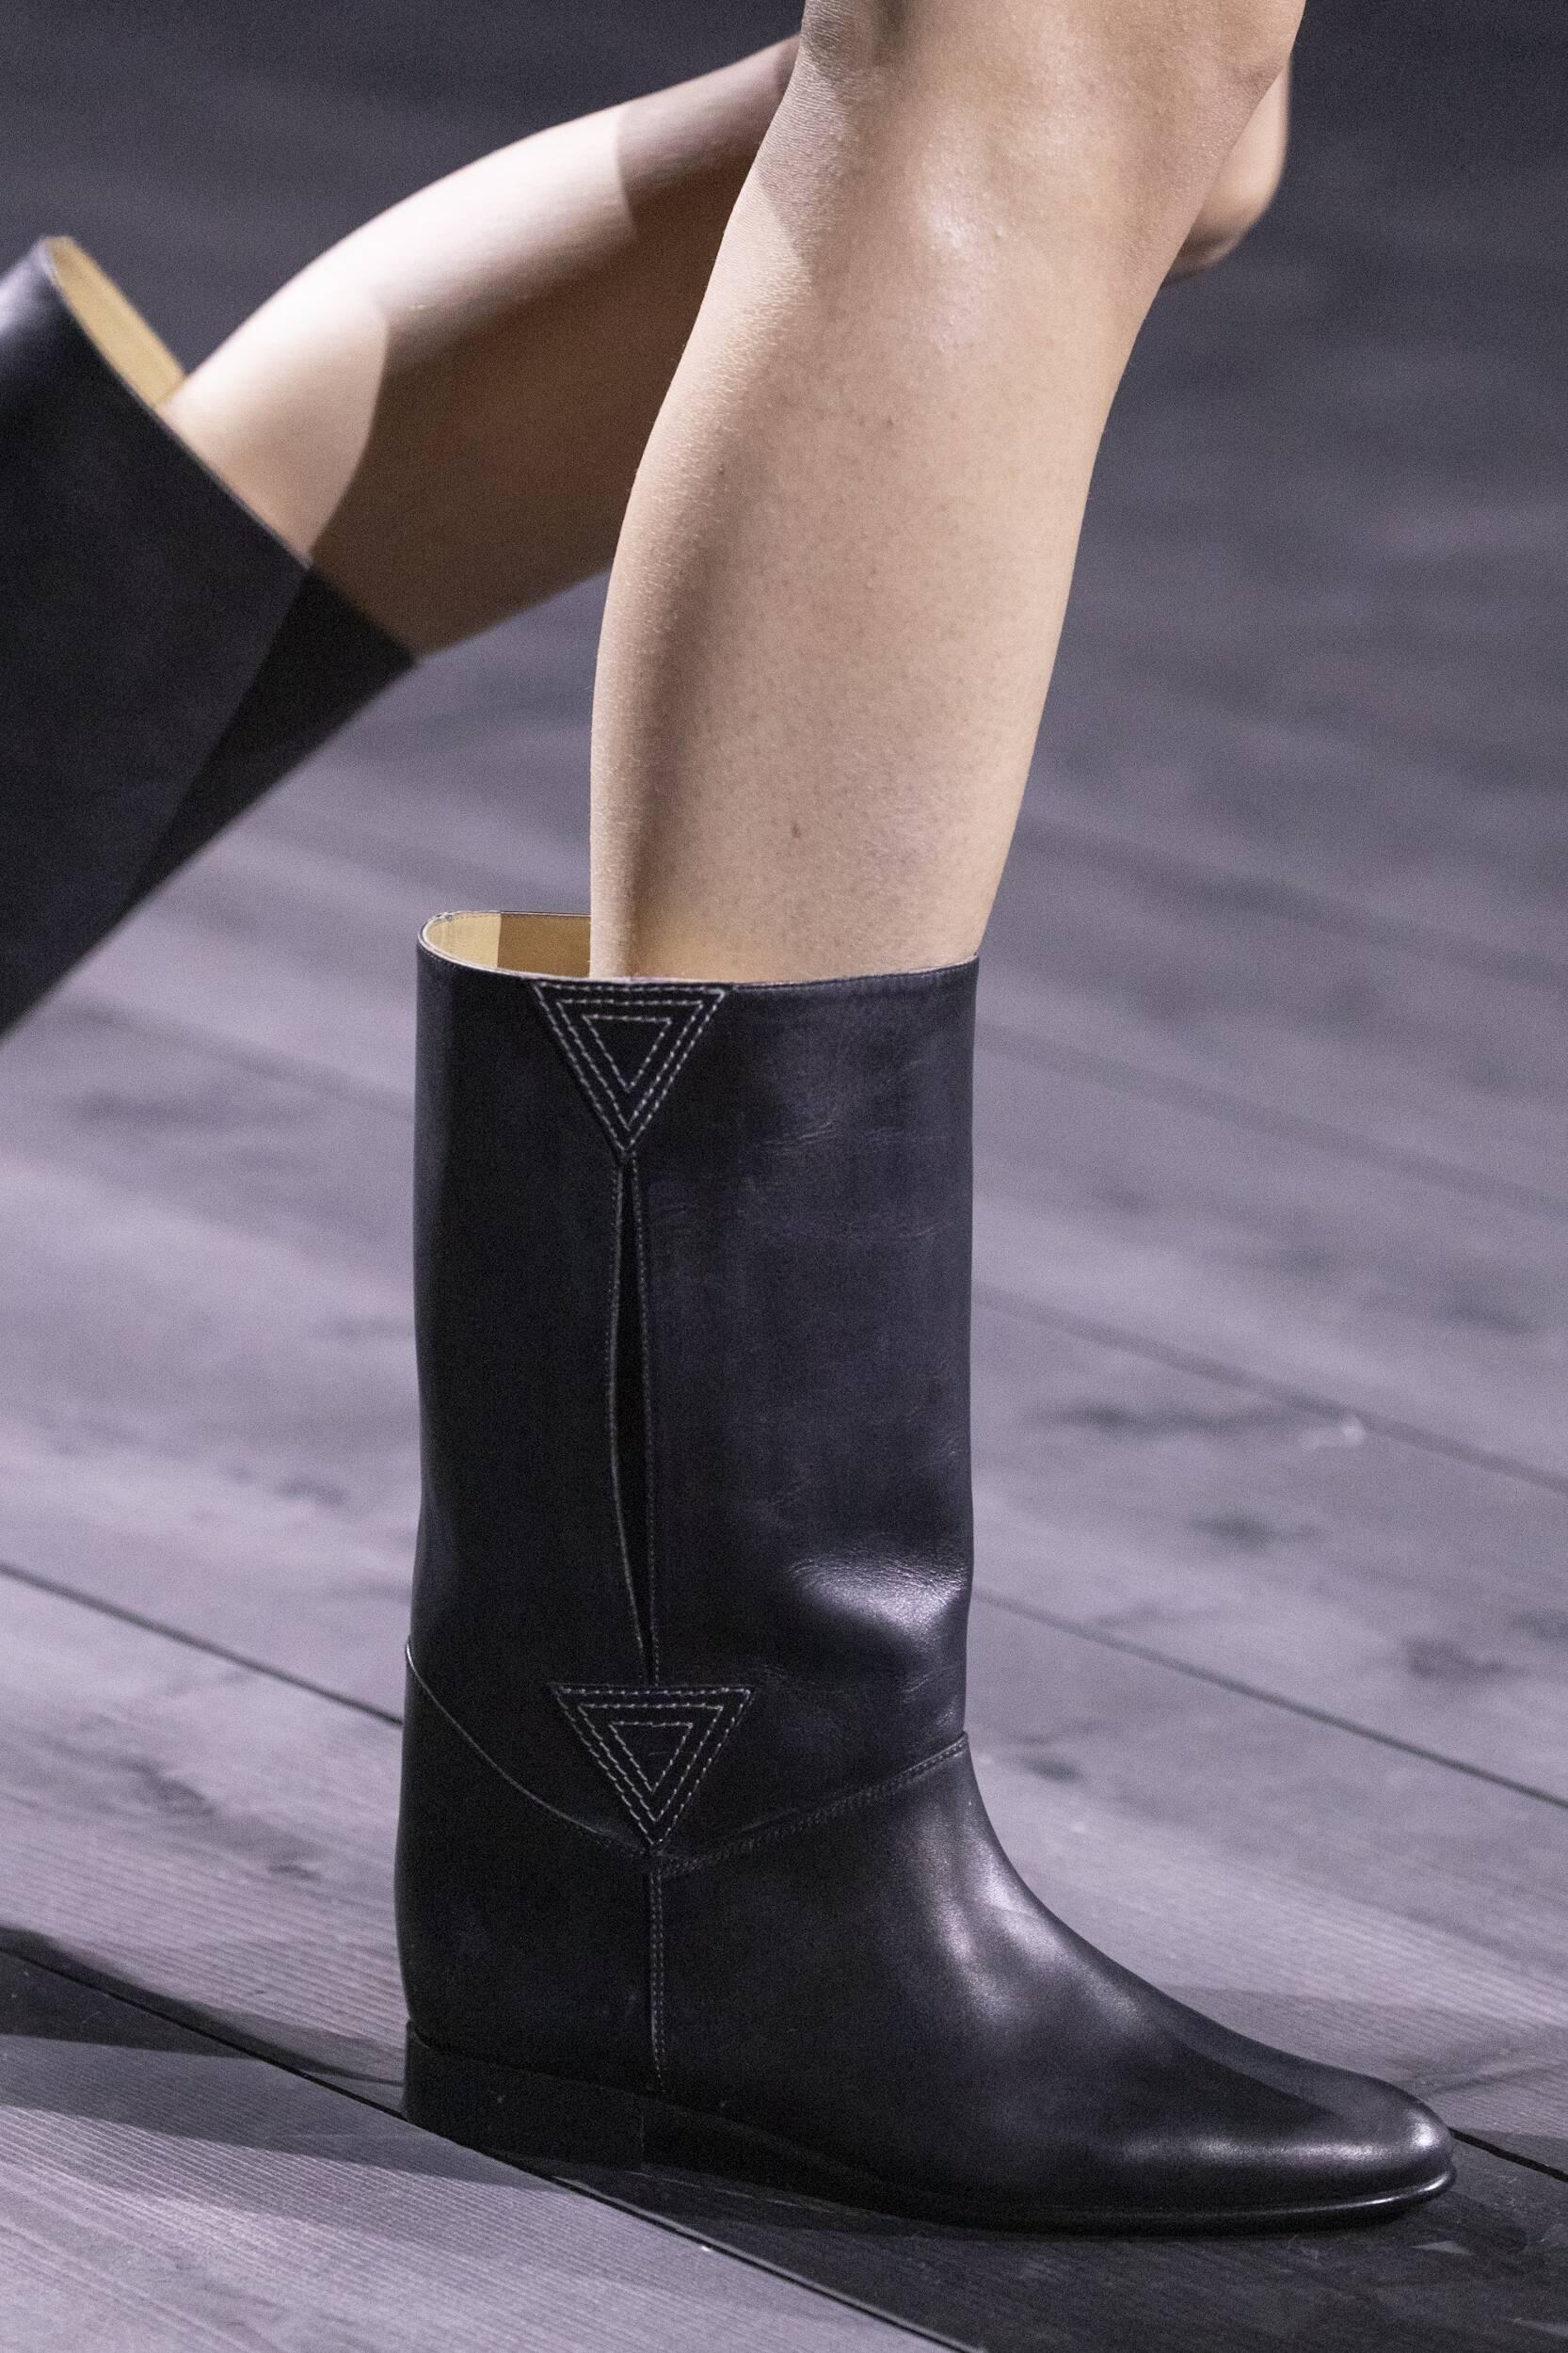 Louis Vuitton Boots Winter 2020 Collection Paris Fashion Week